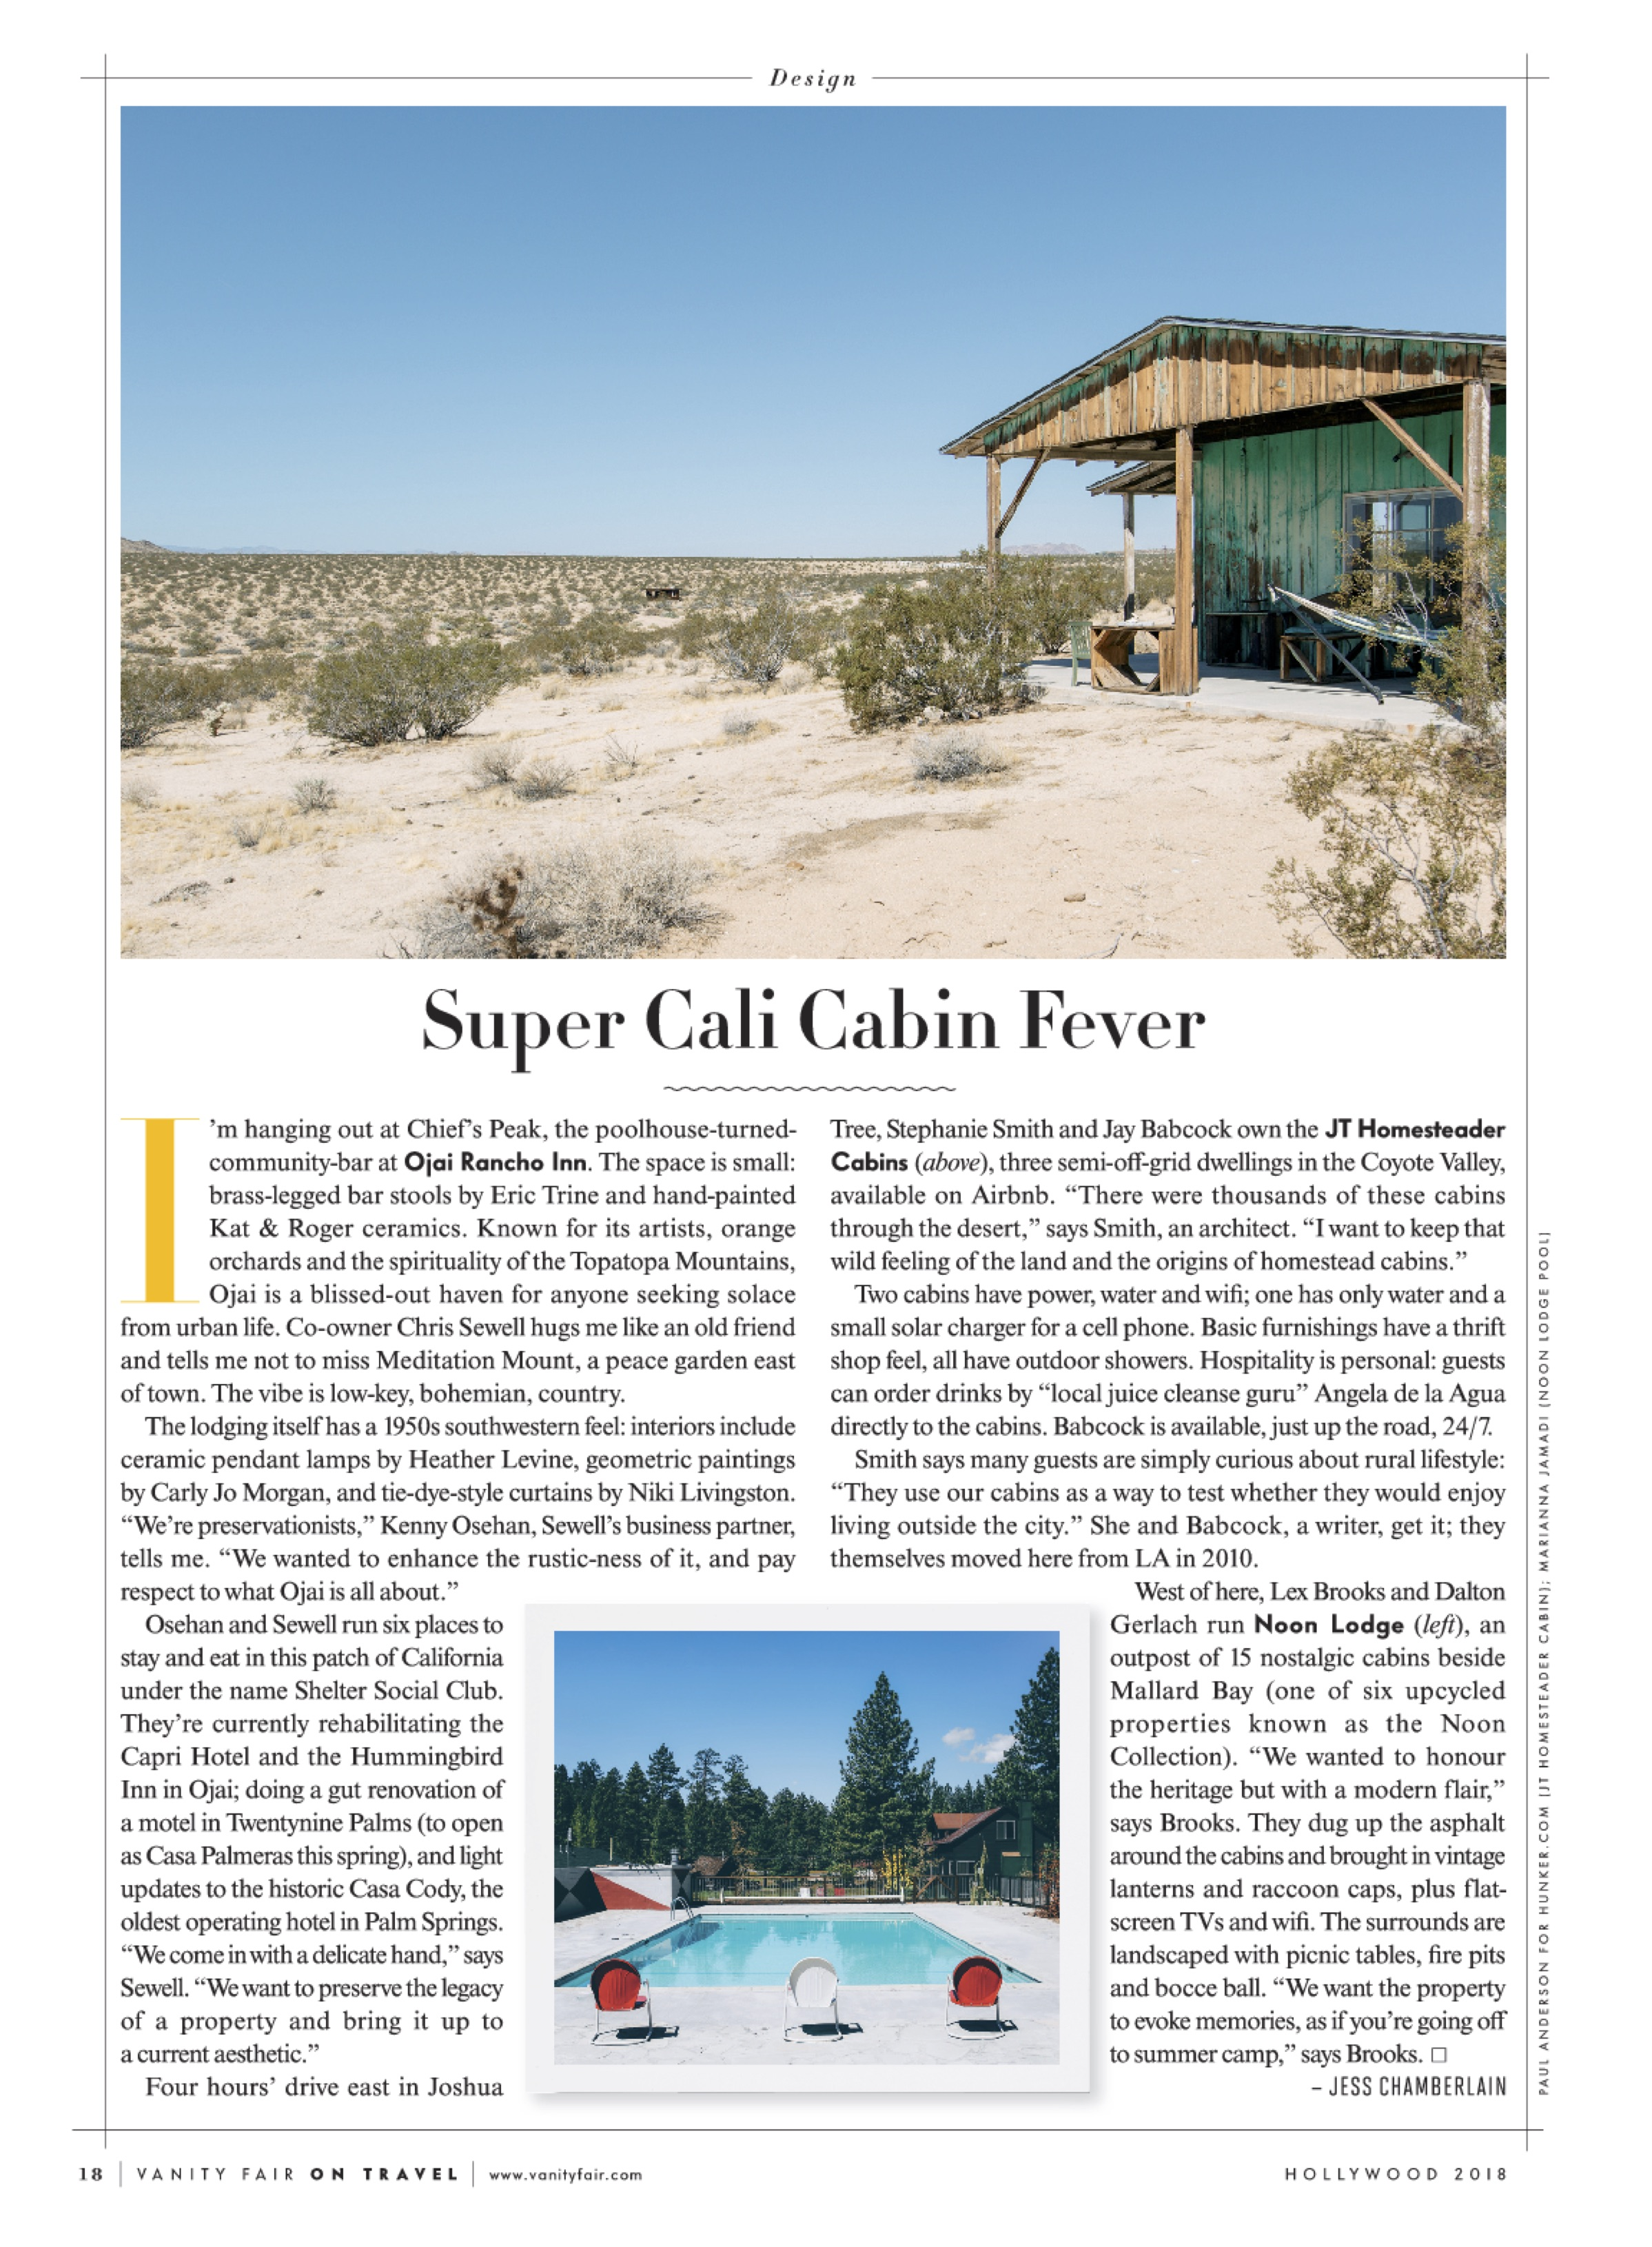 Super Cali Cabin Fever.jpg